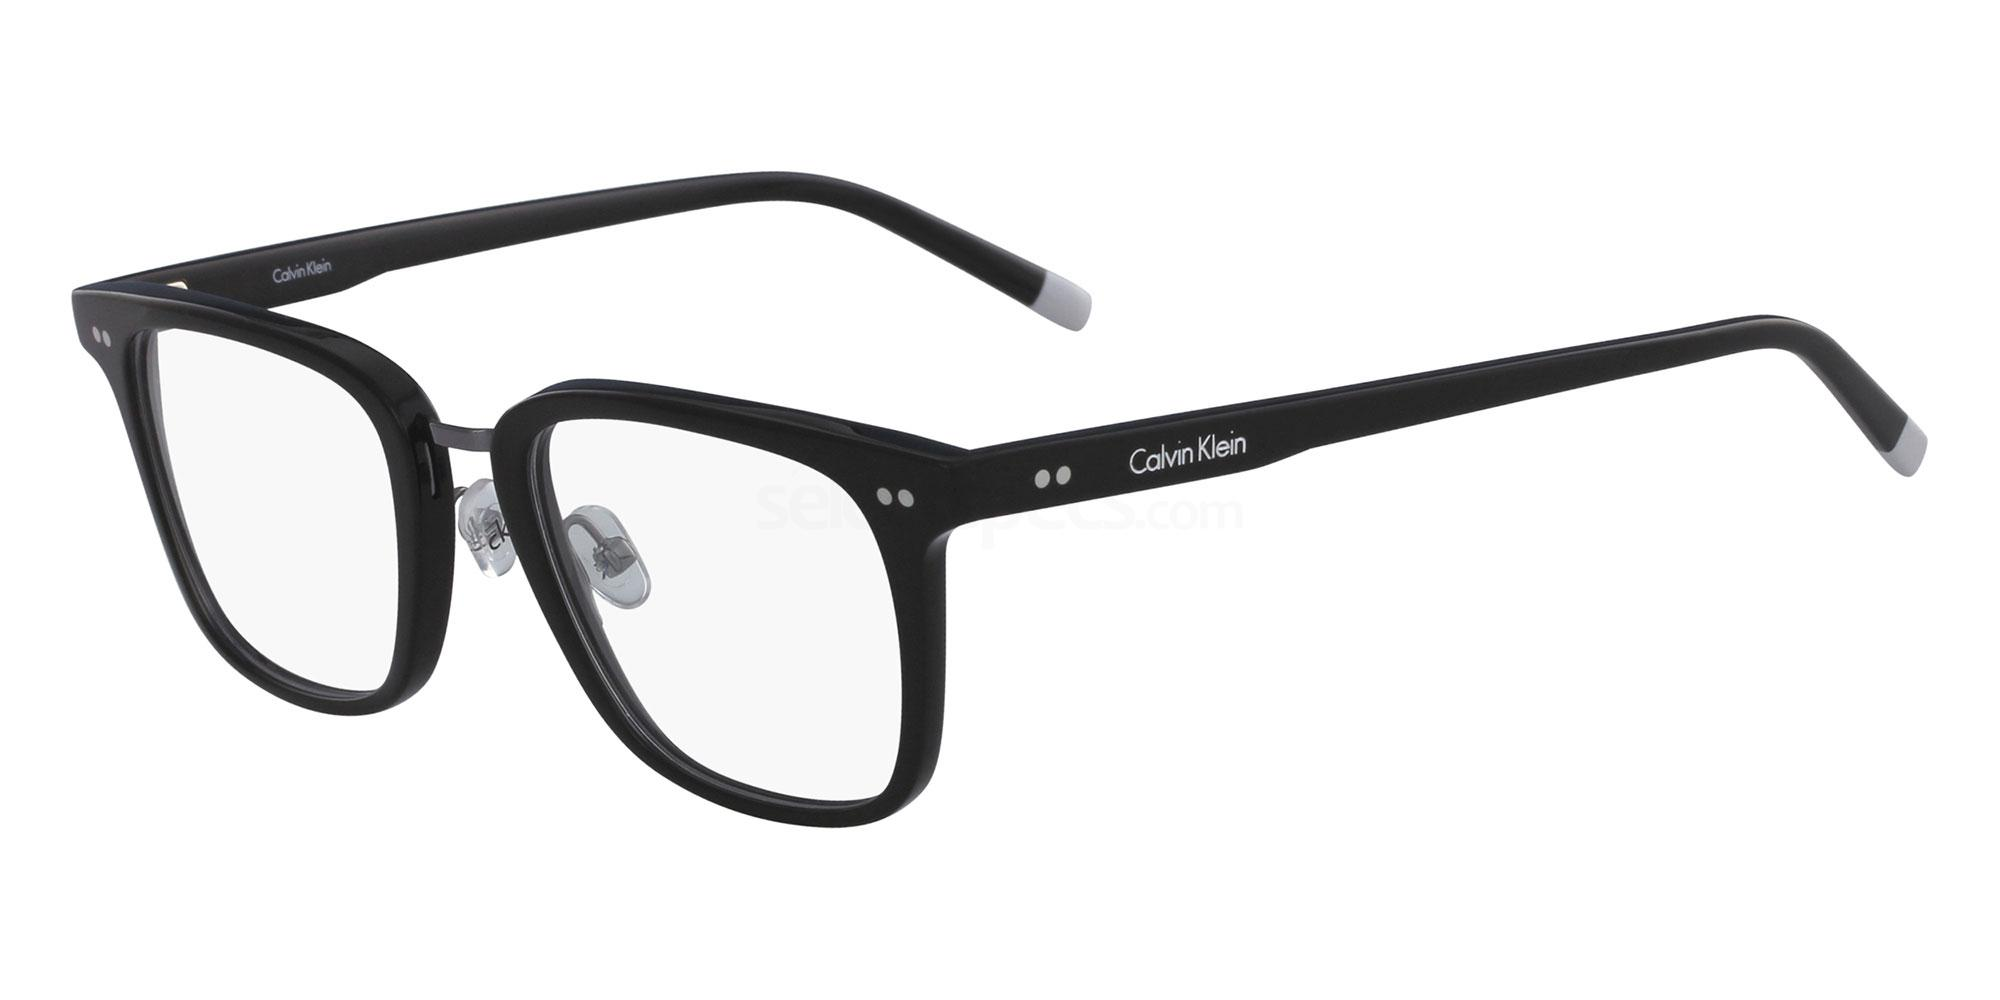 001 CK6006 Glasses, Calvin Klein